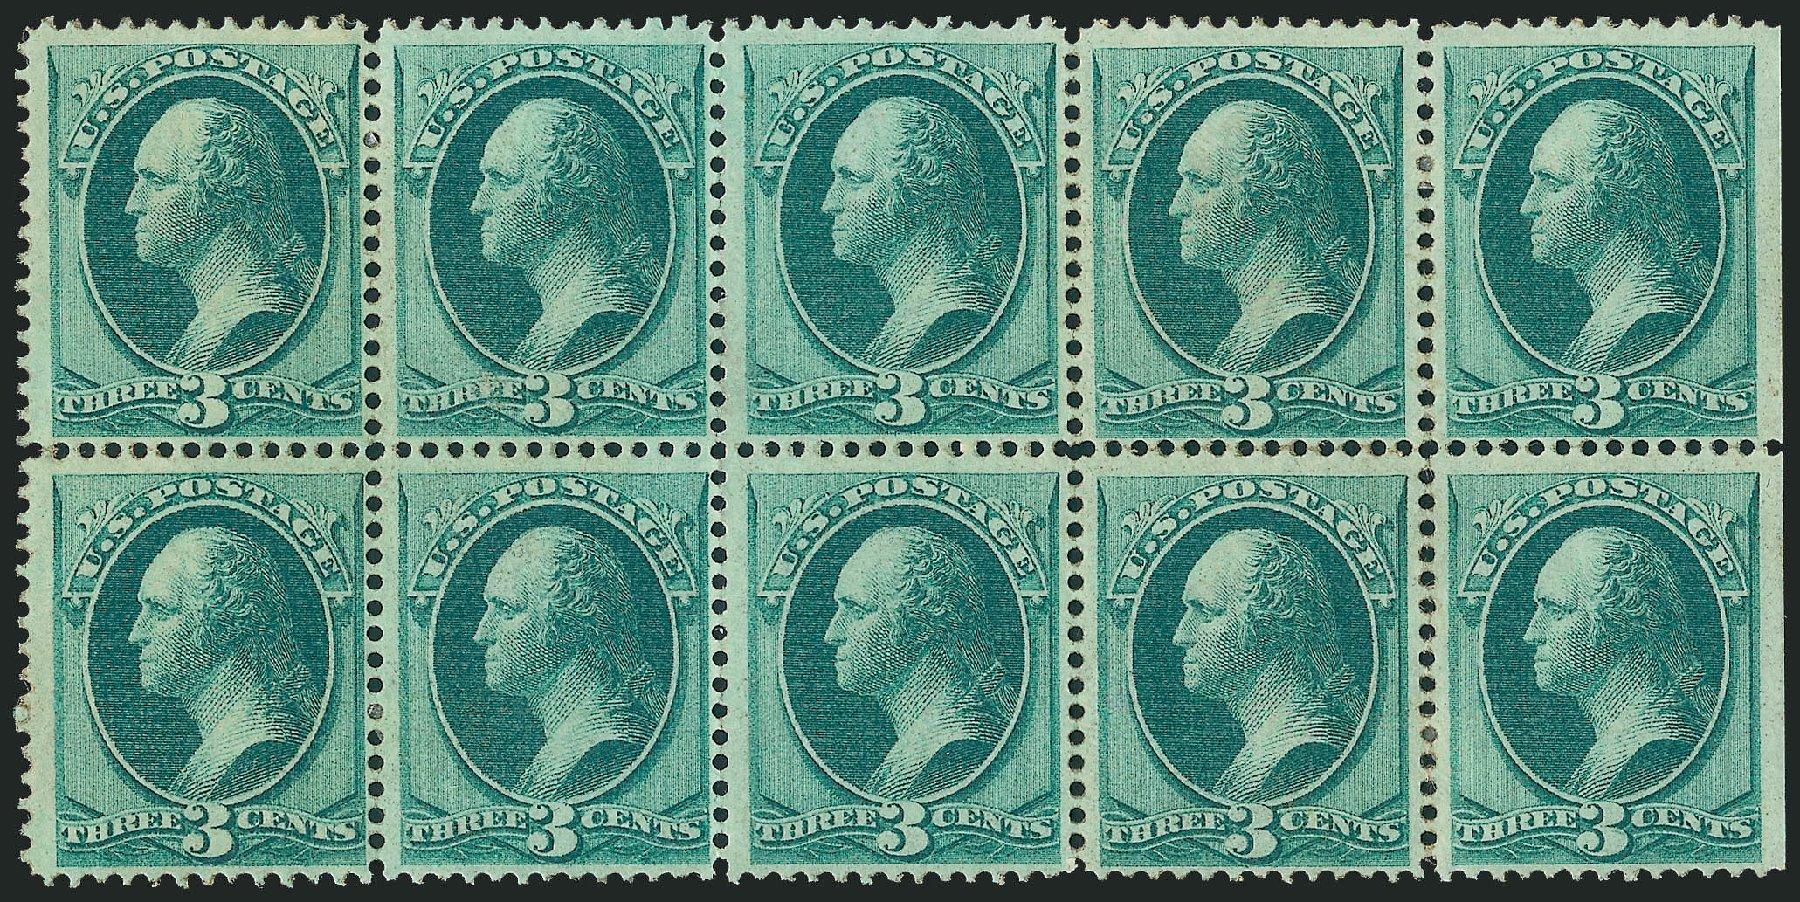 US Stamps Price Scott Cat. 147: 1870 3c Washington Without Grill. Robert Siegel Auction Galleries, Mar 2012, Sale 1021, Lot 352